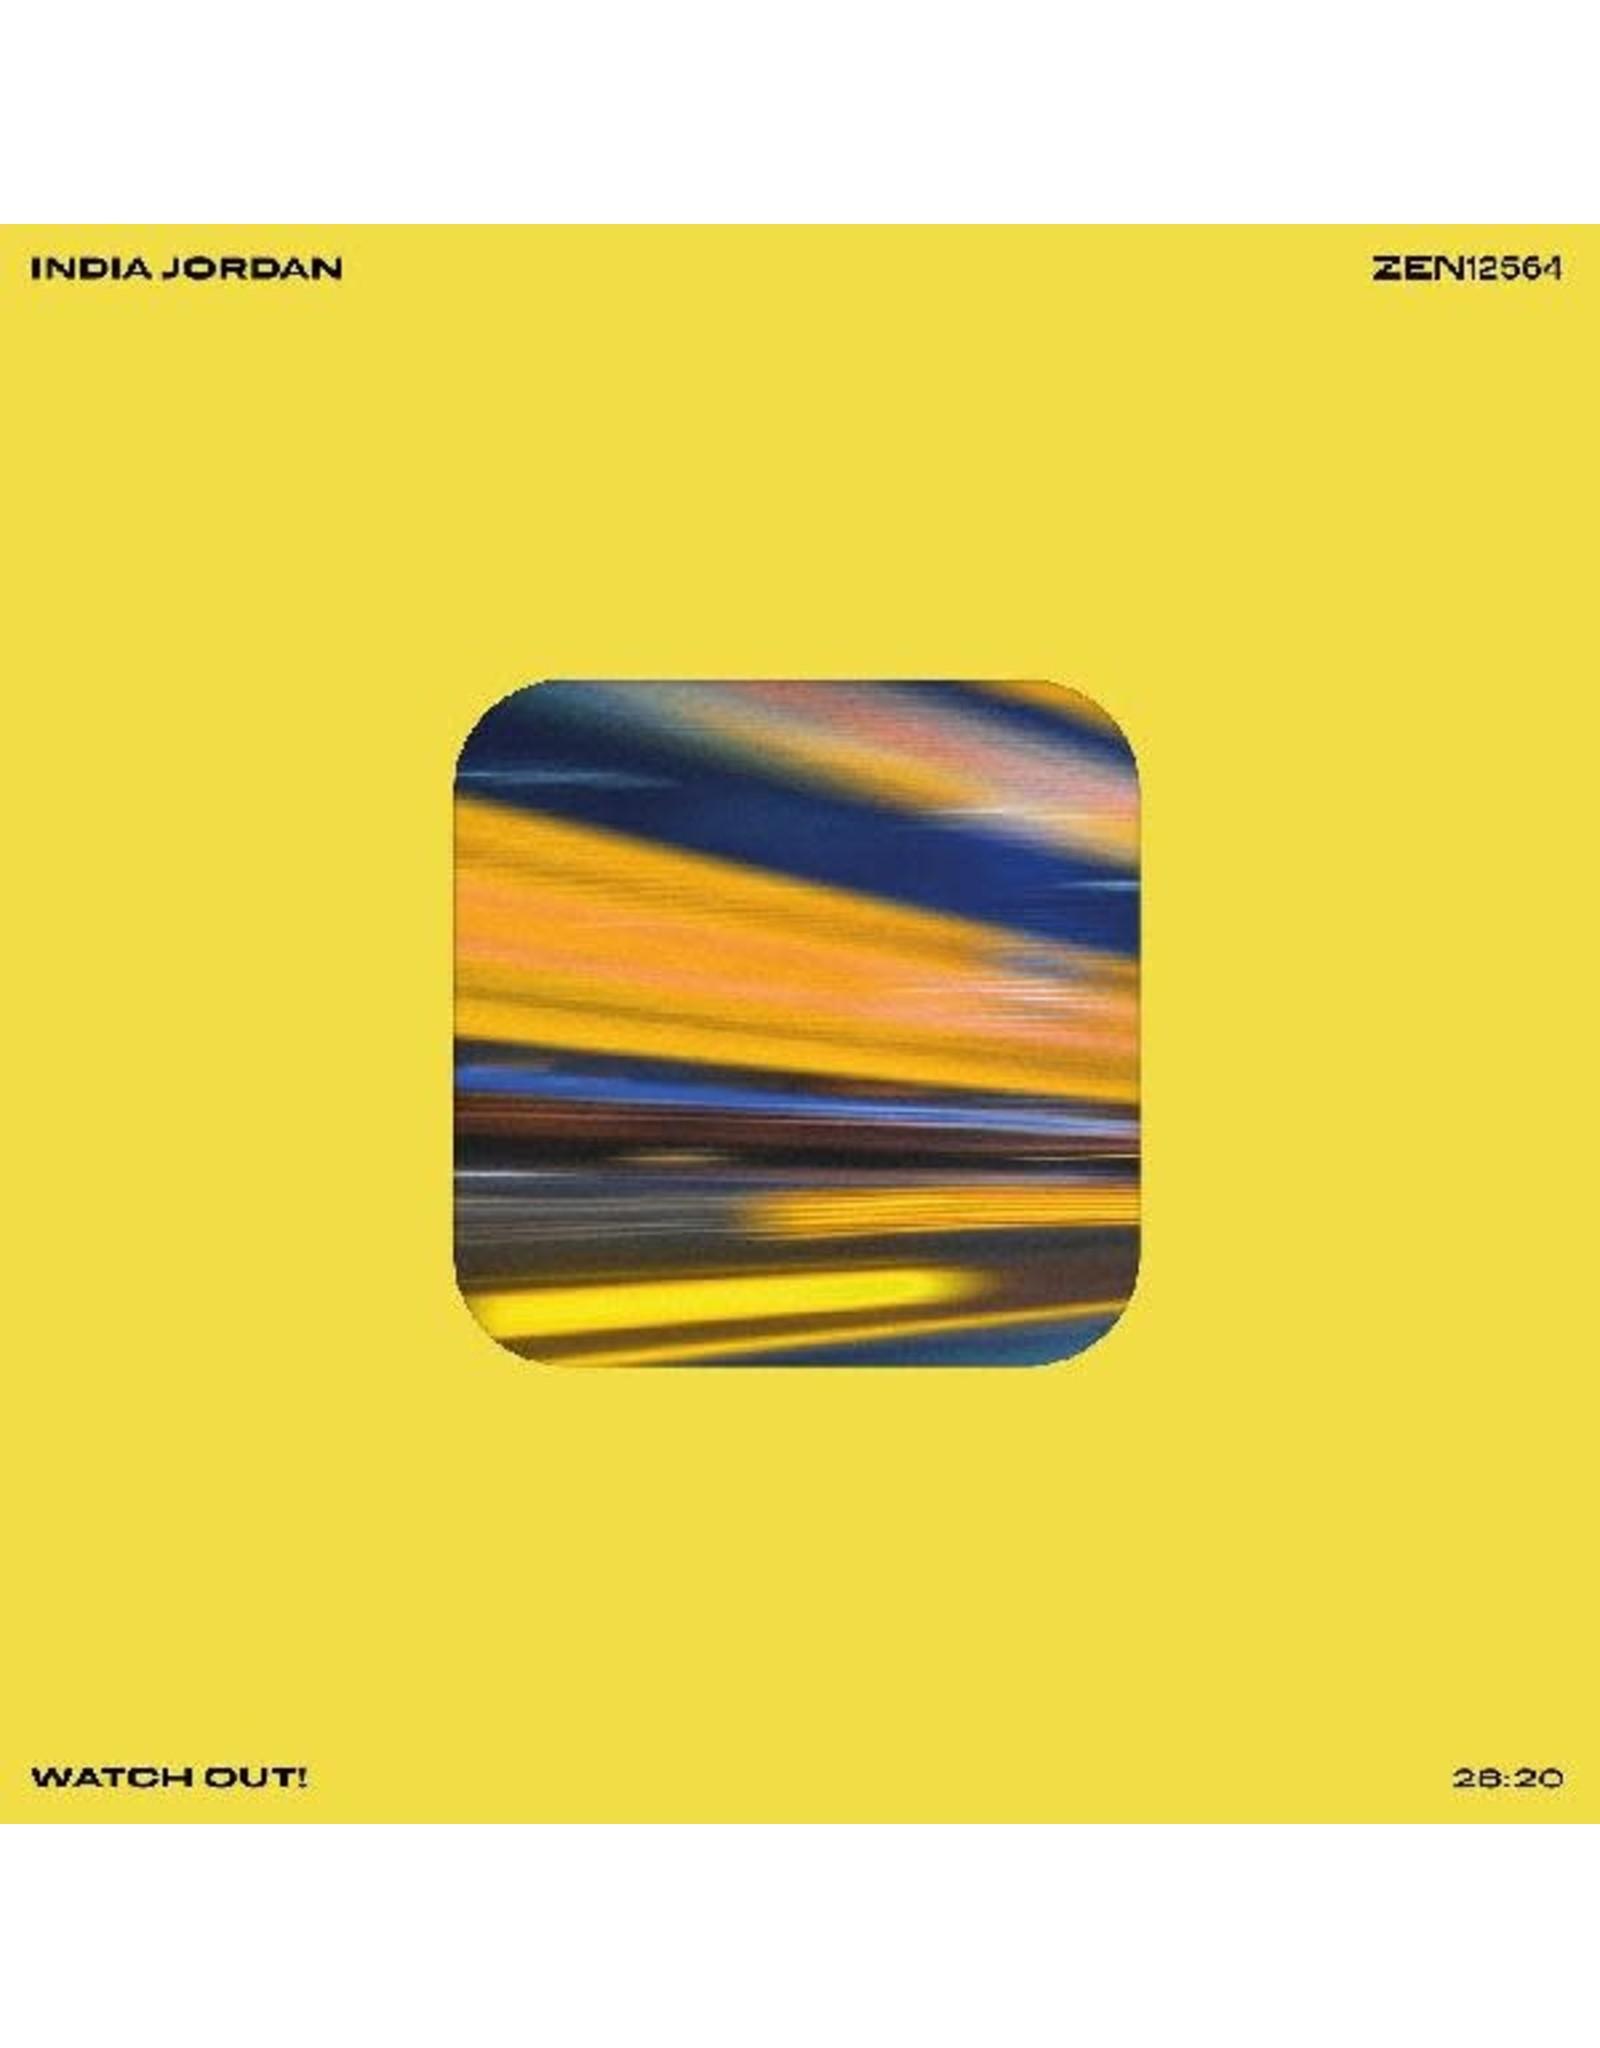 "New Vinyl India Jordan - Watch Out! EP 12"""